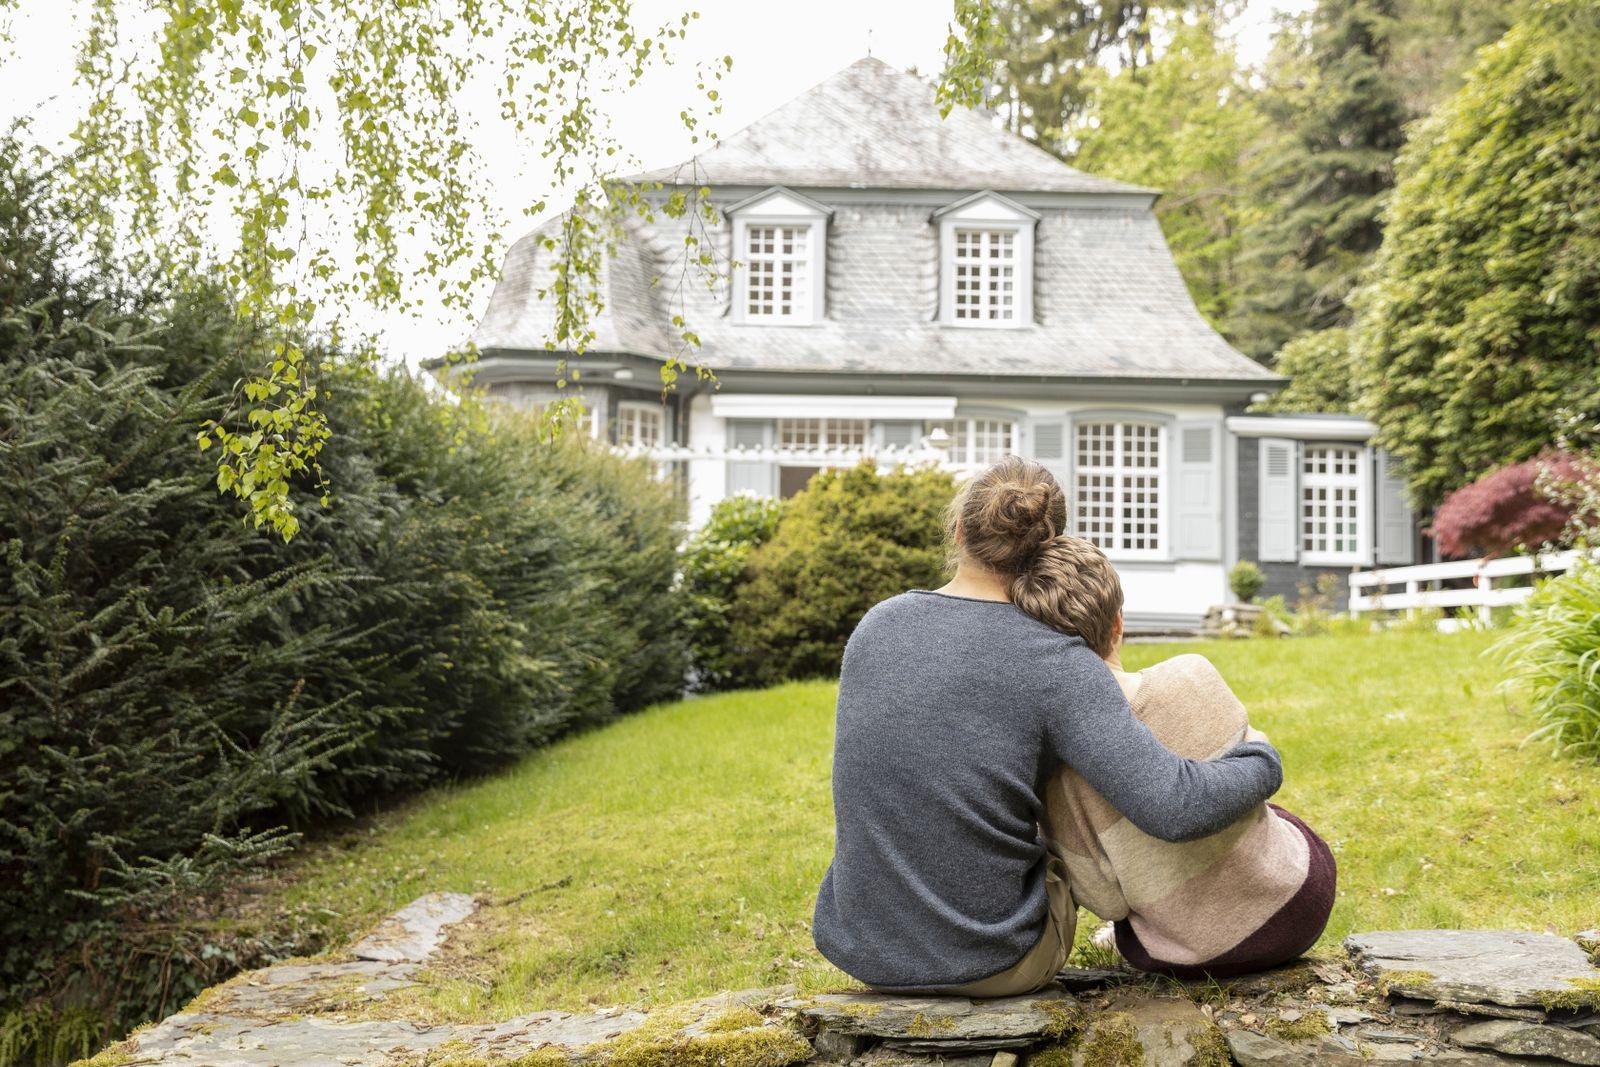 Rear view of couple sitting on a wall in garden model released Symbolfoto property released PUBLICATIONxINxGERxSUIxAUTxH